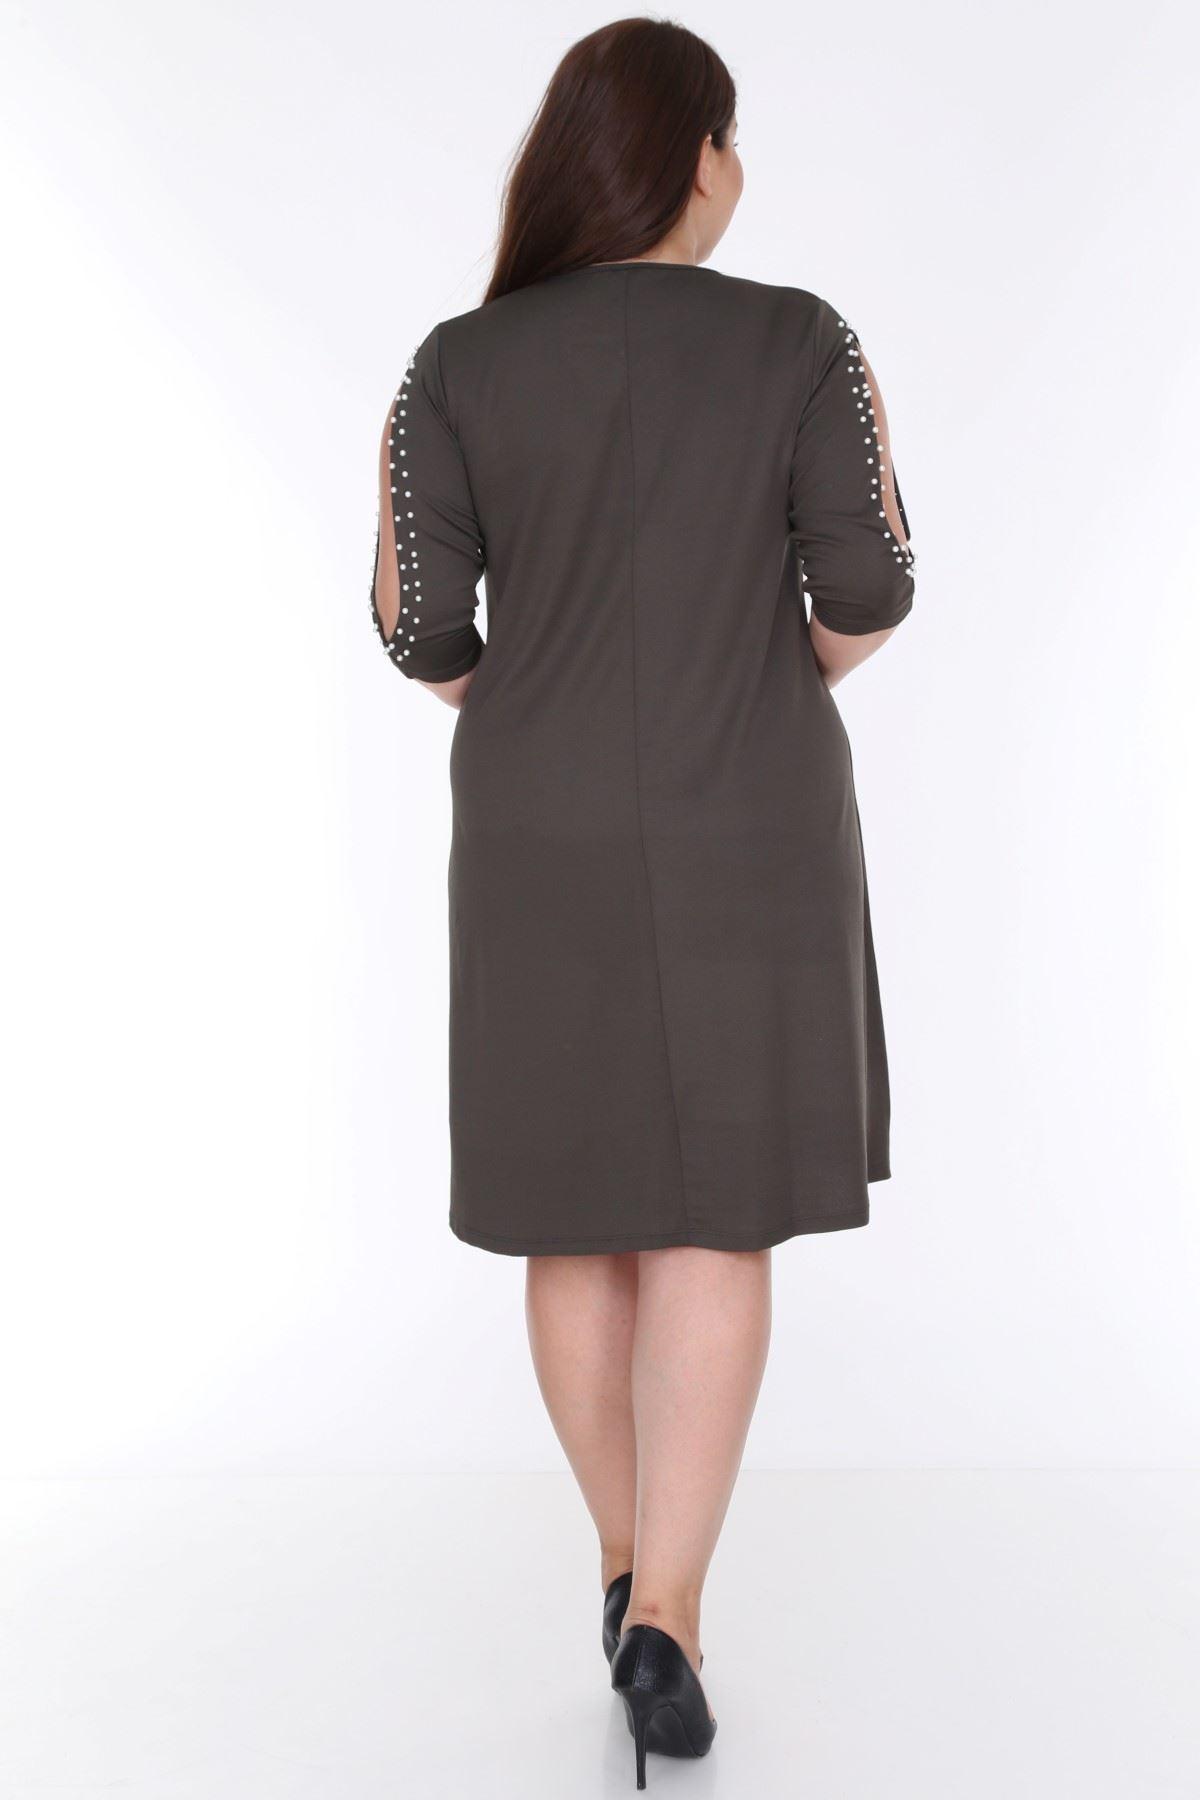 Kol incili Haki Elbise 9E-0612